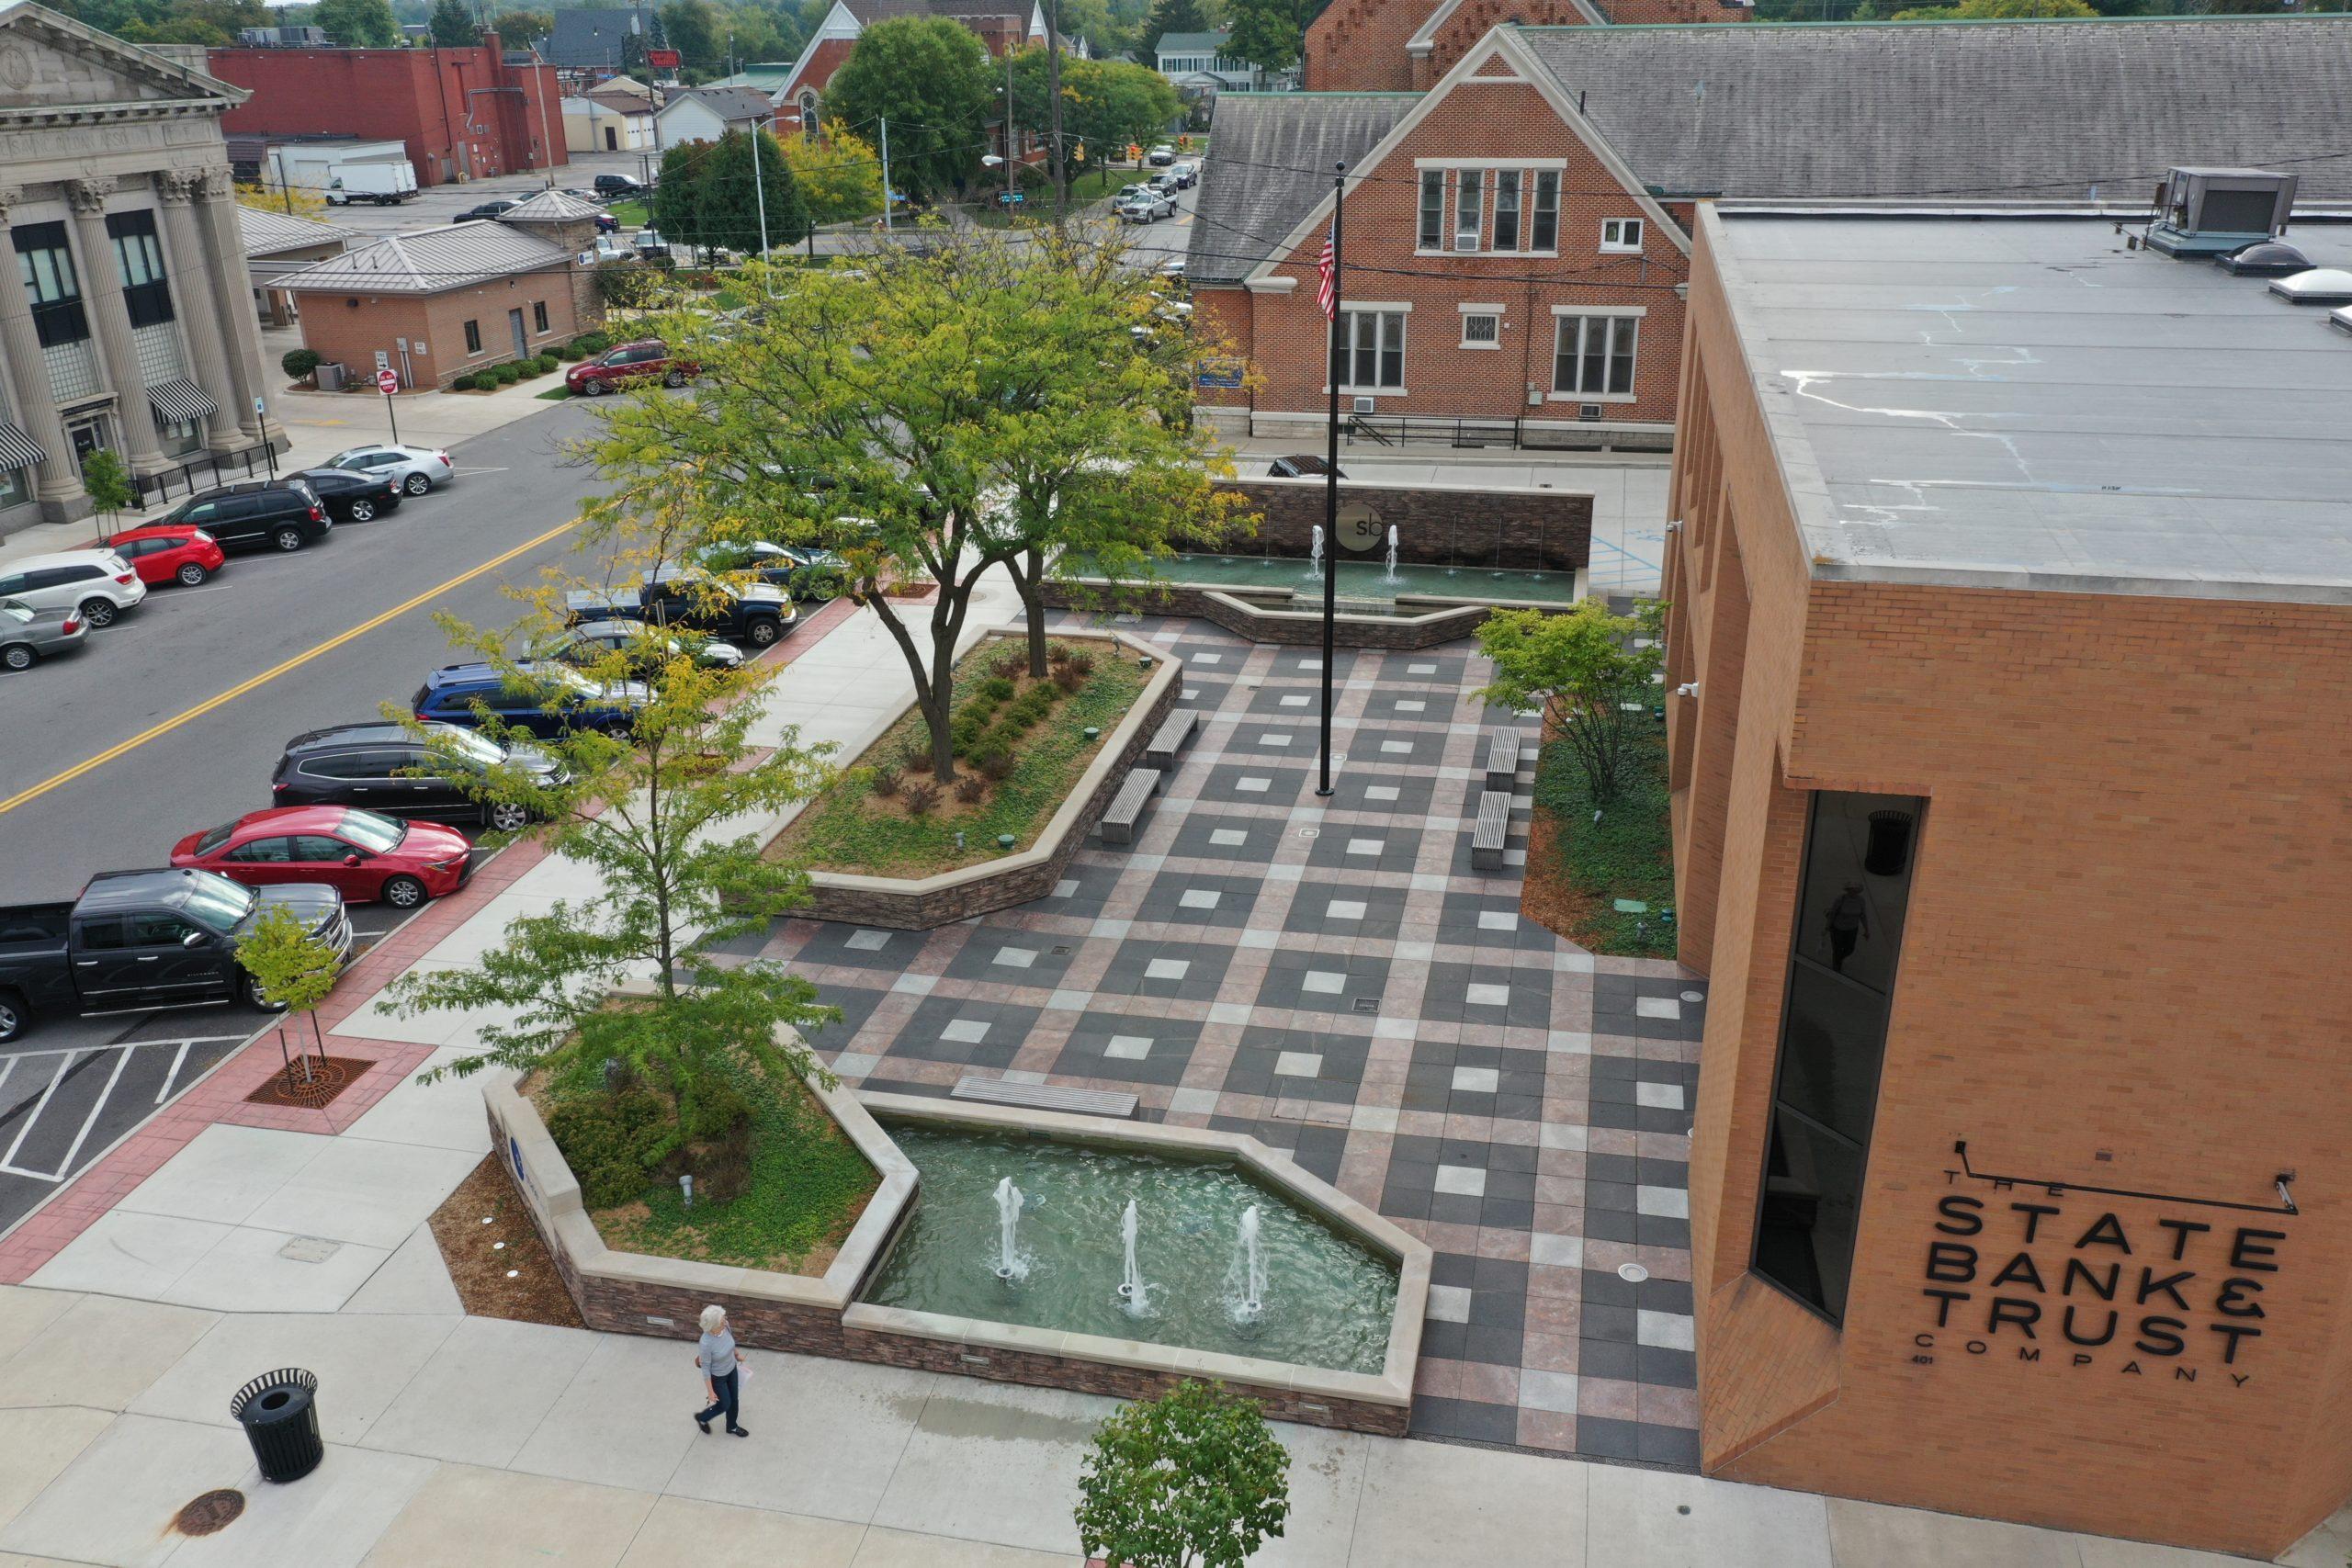 State Bank Pedestrian Plaza – Defiance, Ohio